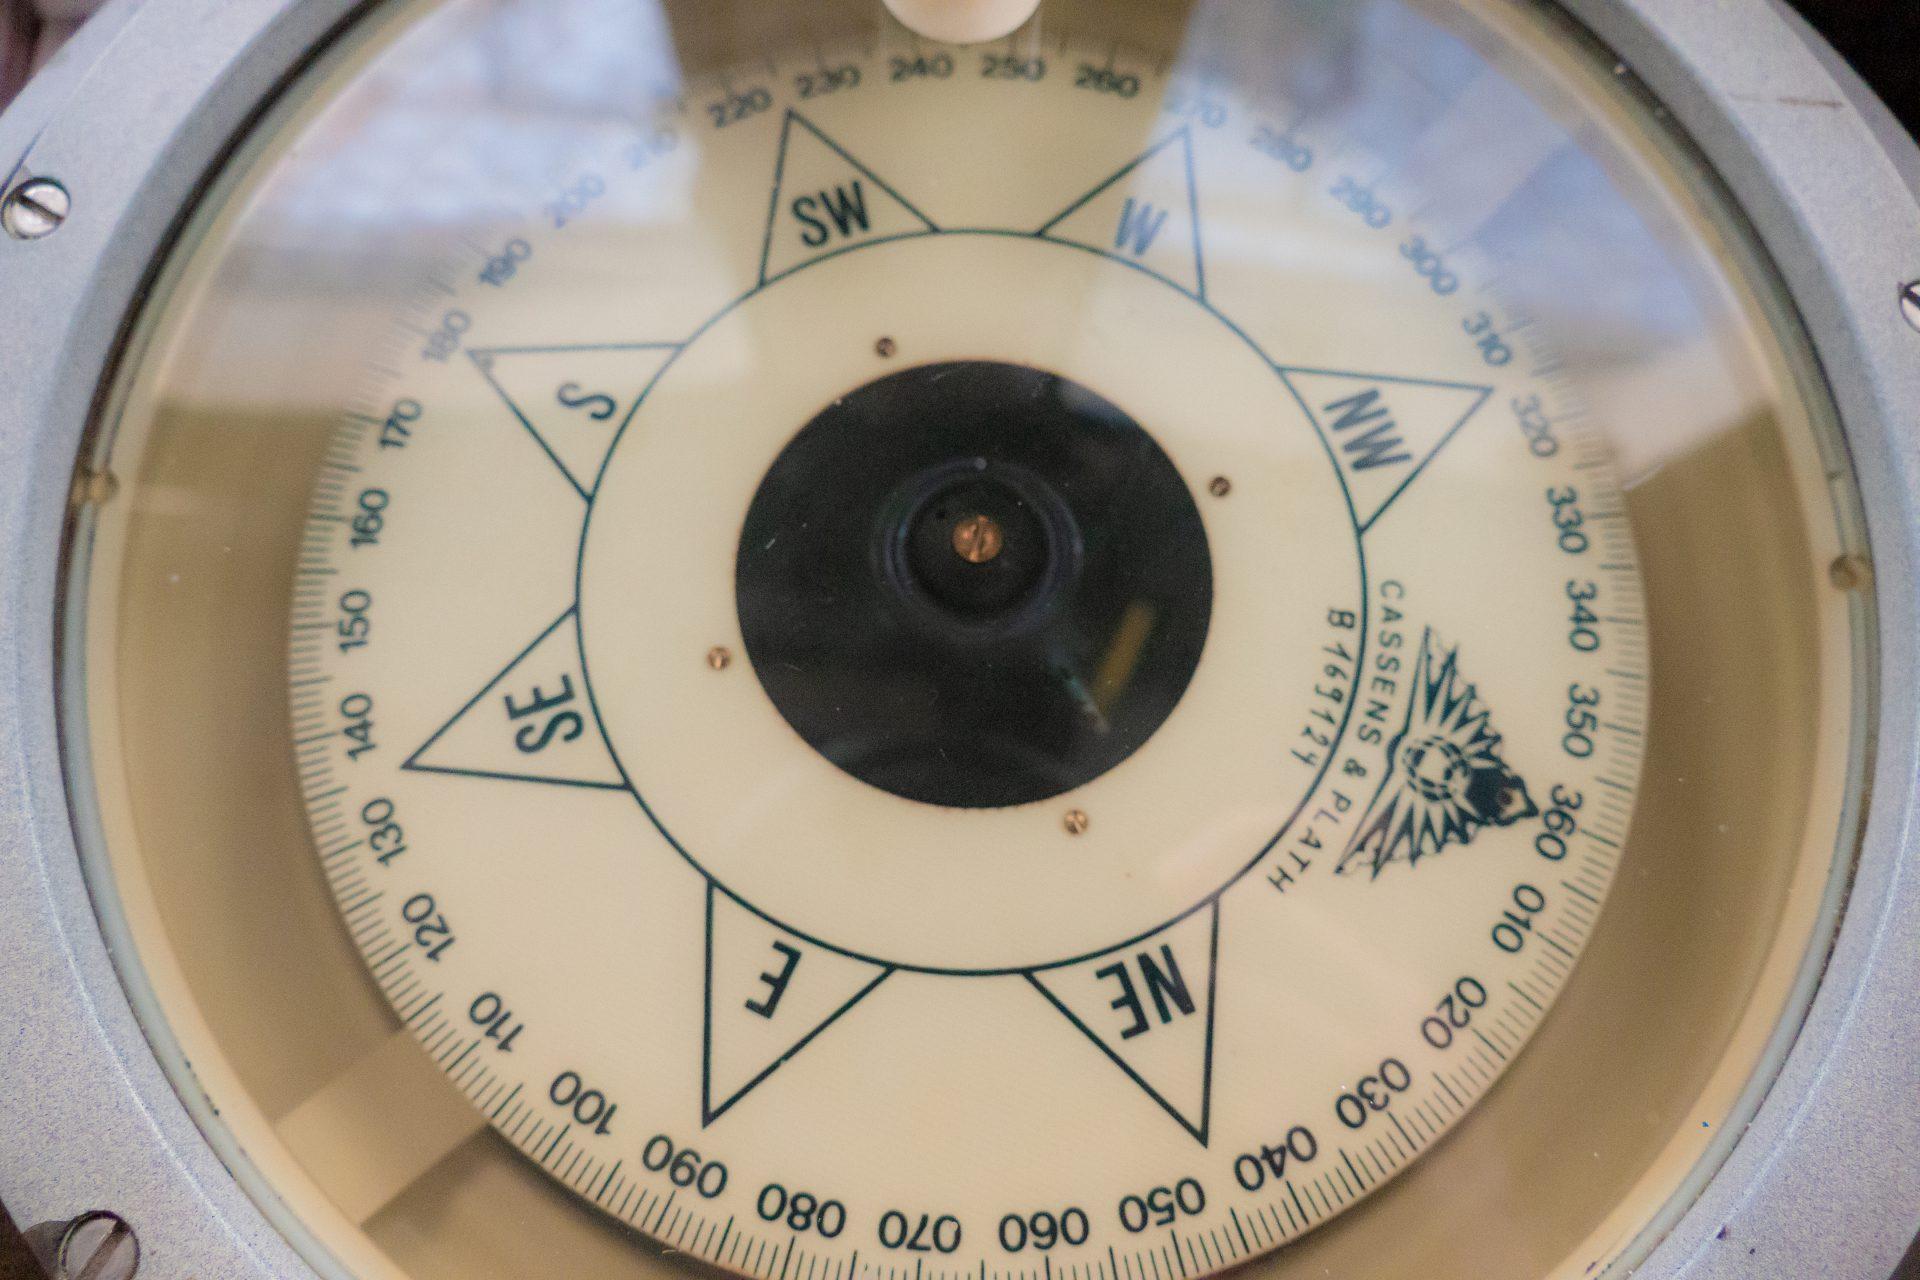 Nordseekerl- Über uns- Schiffskompass